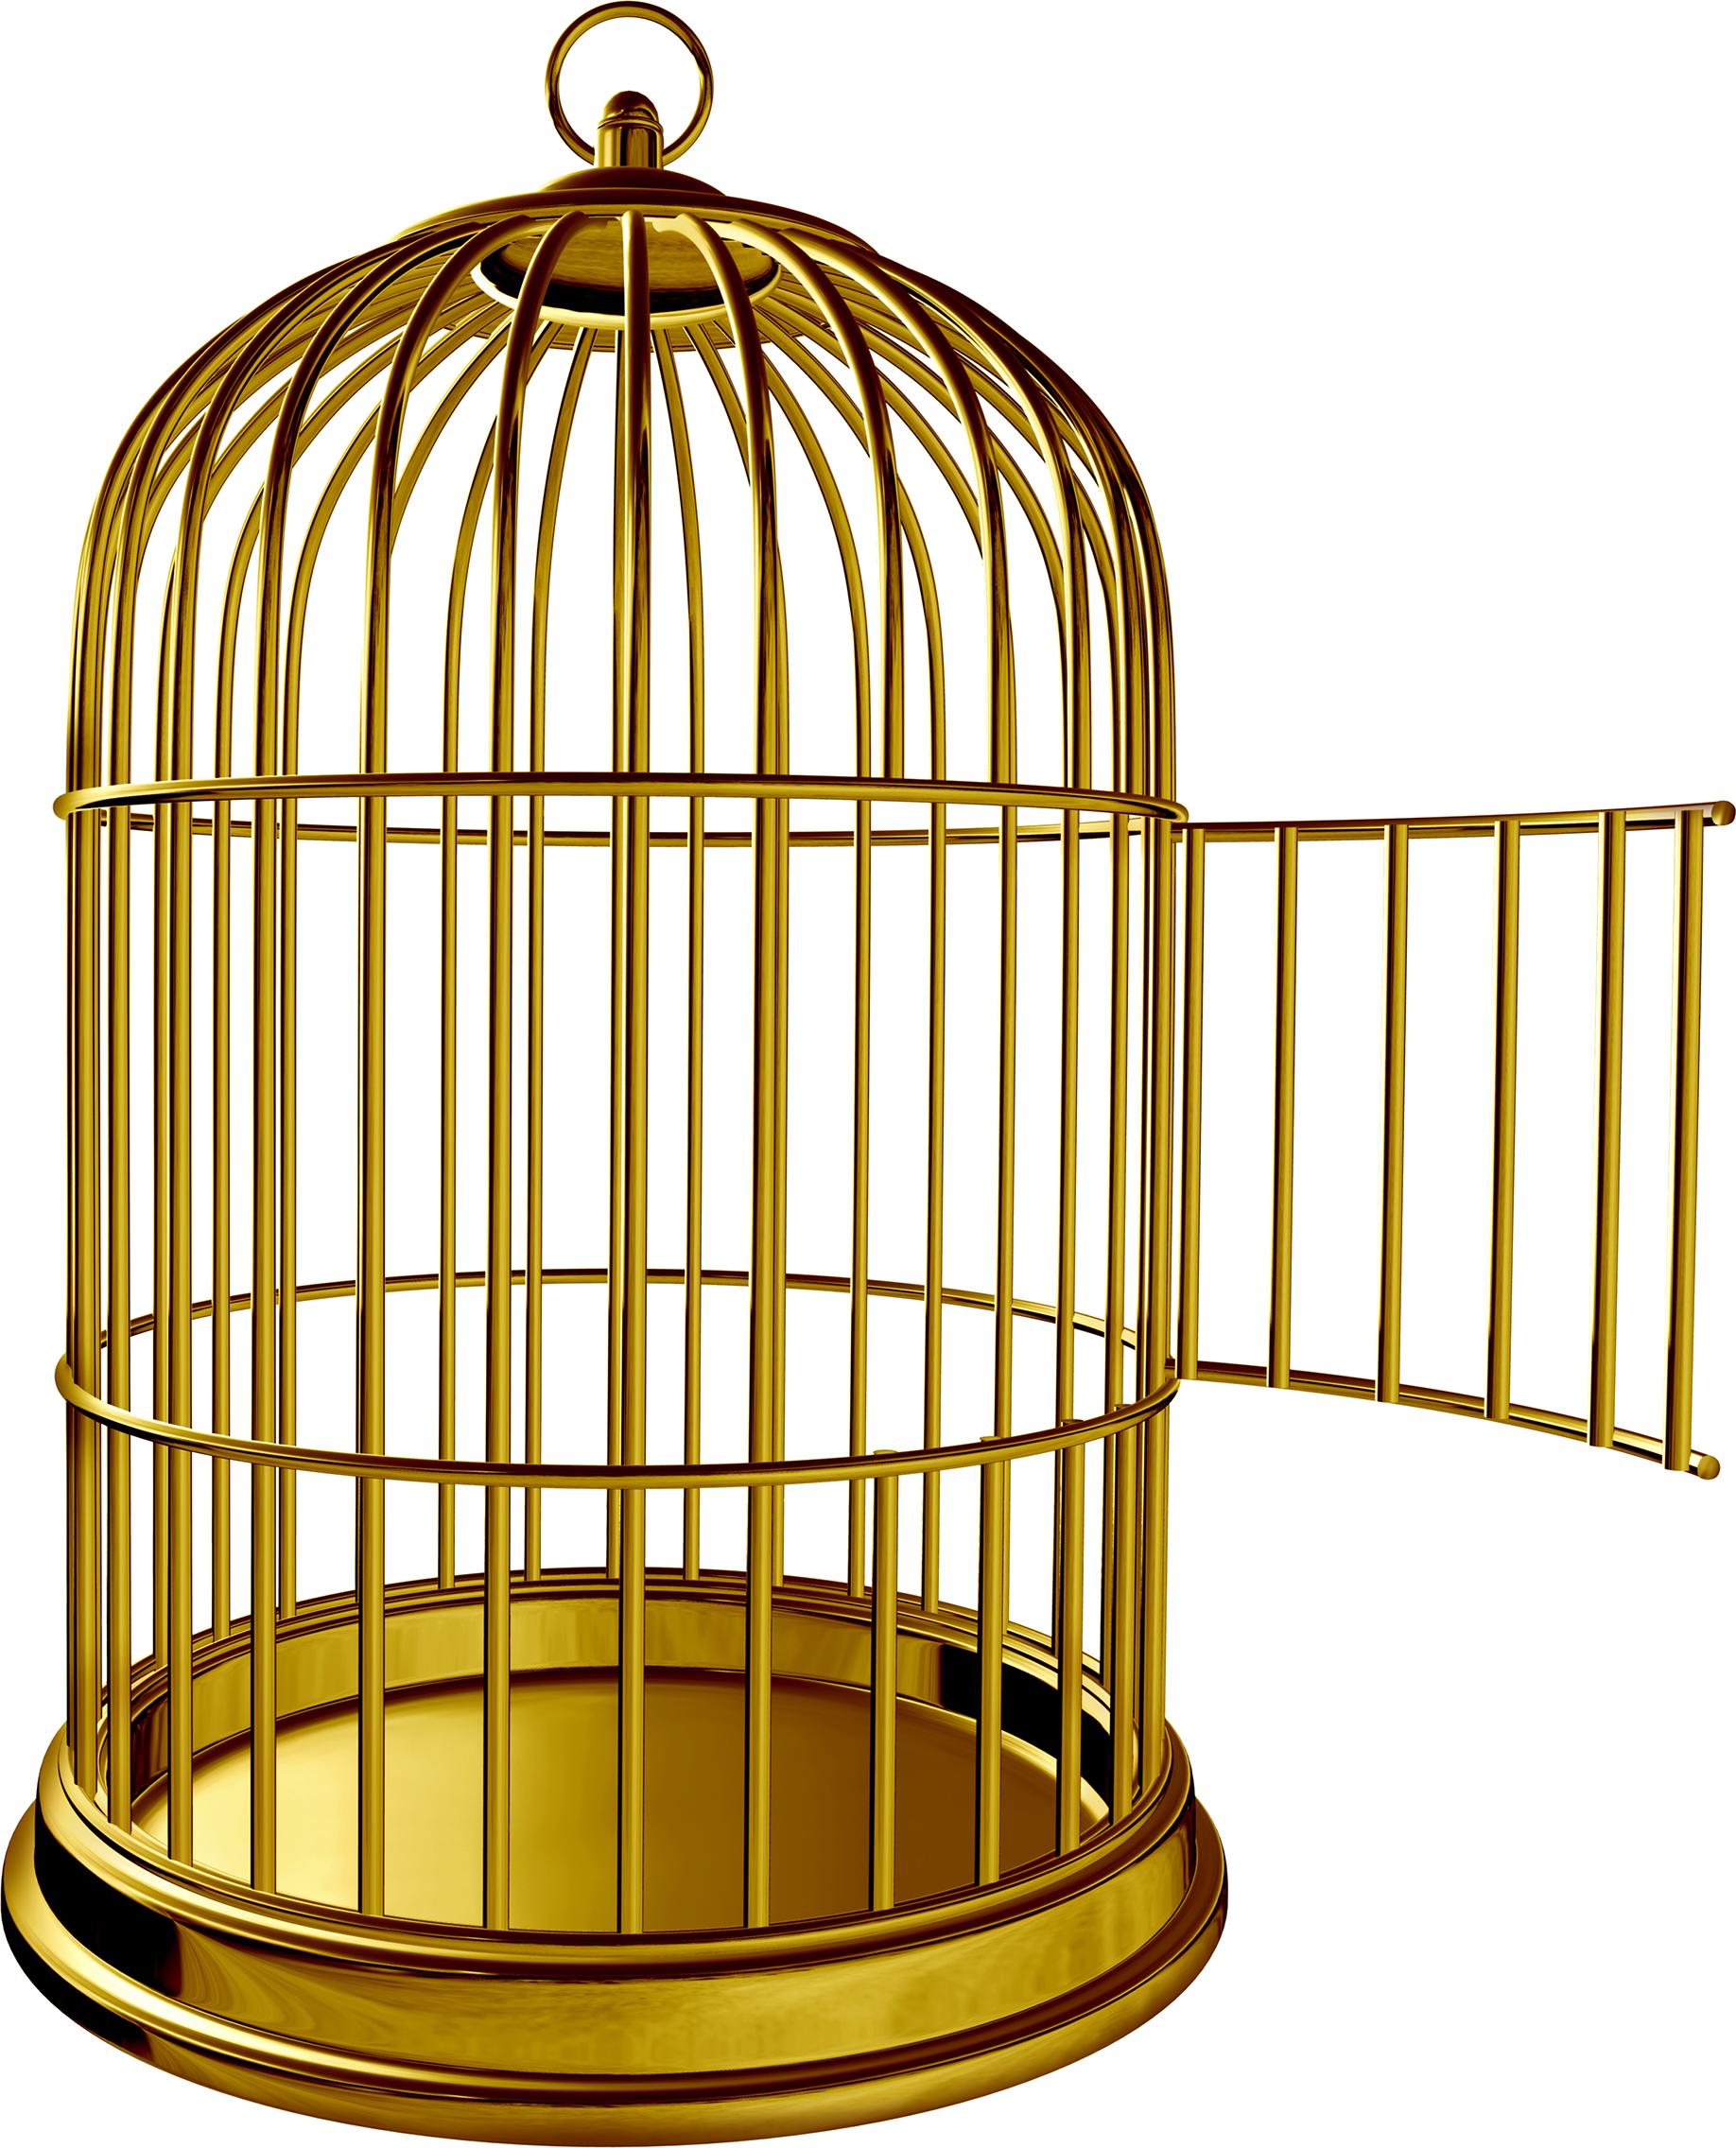 Birdcage parrot clip art. Cage clipart golden bird